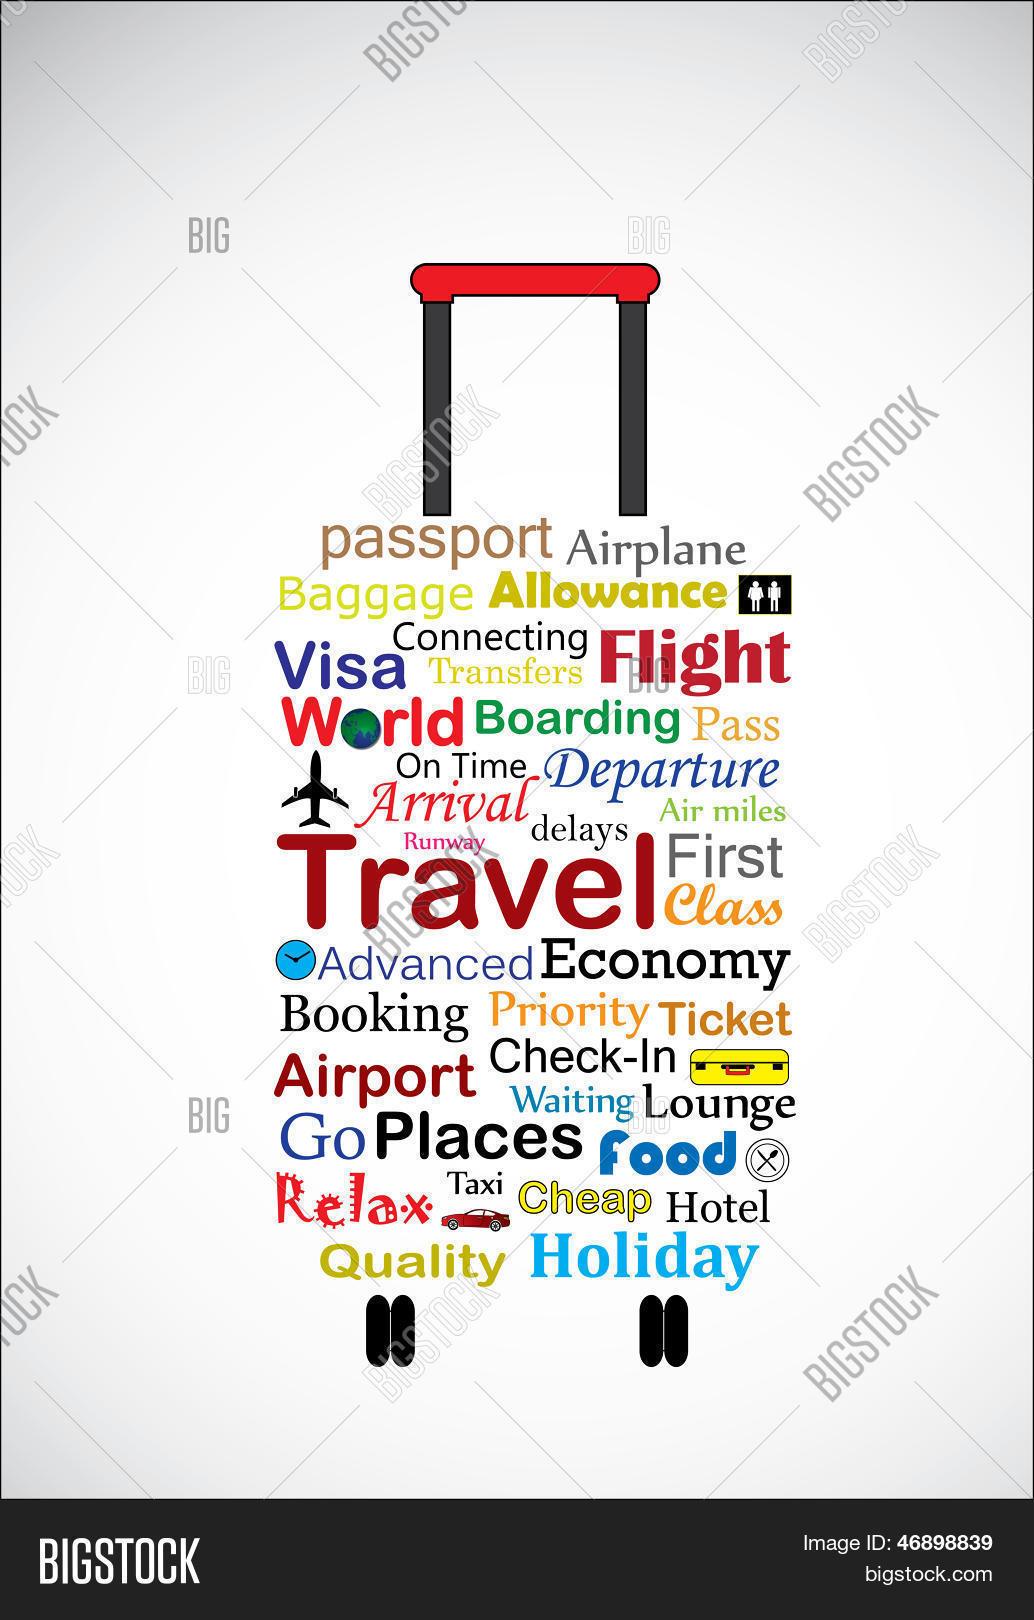 Universal Travel Bag Concept Vector & Photo   Bigstock